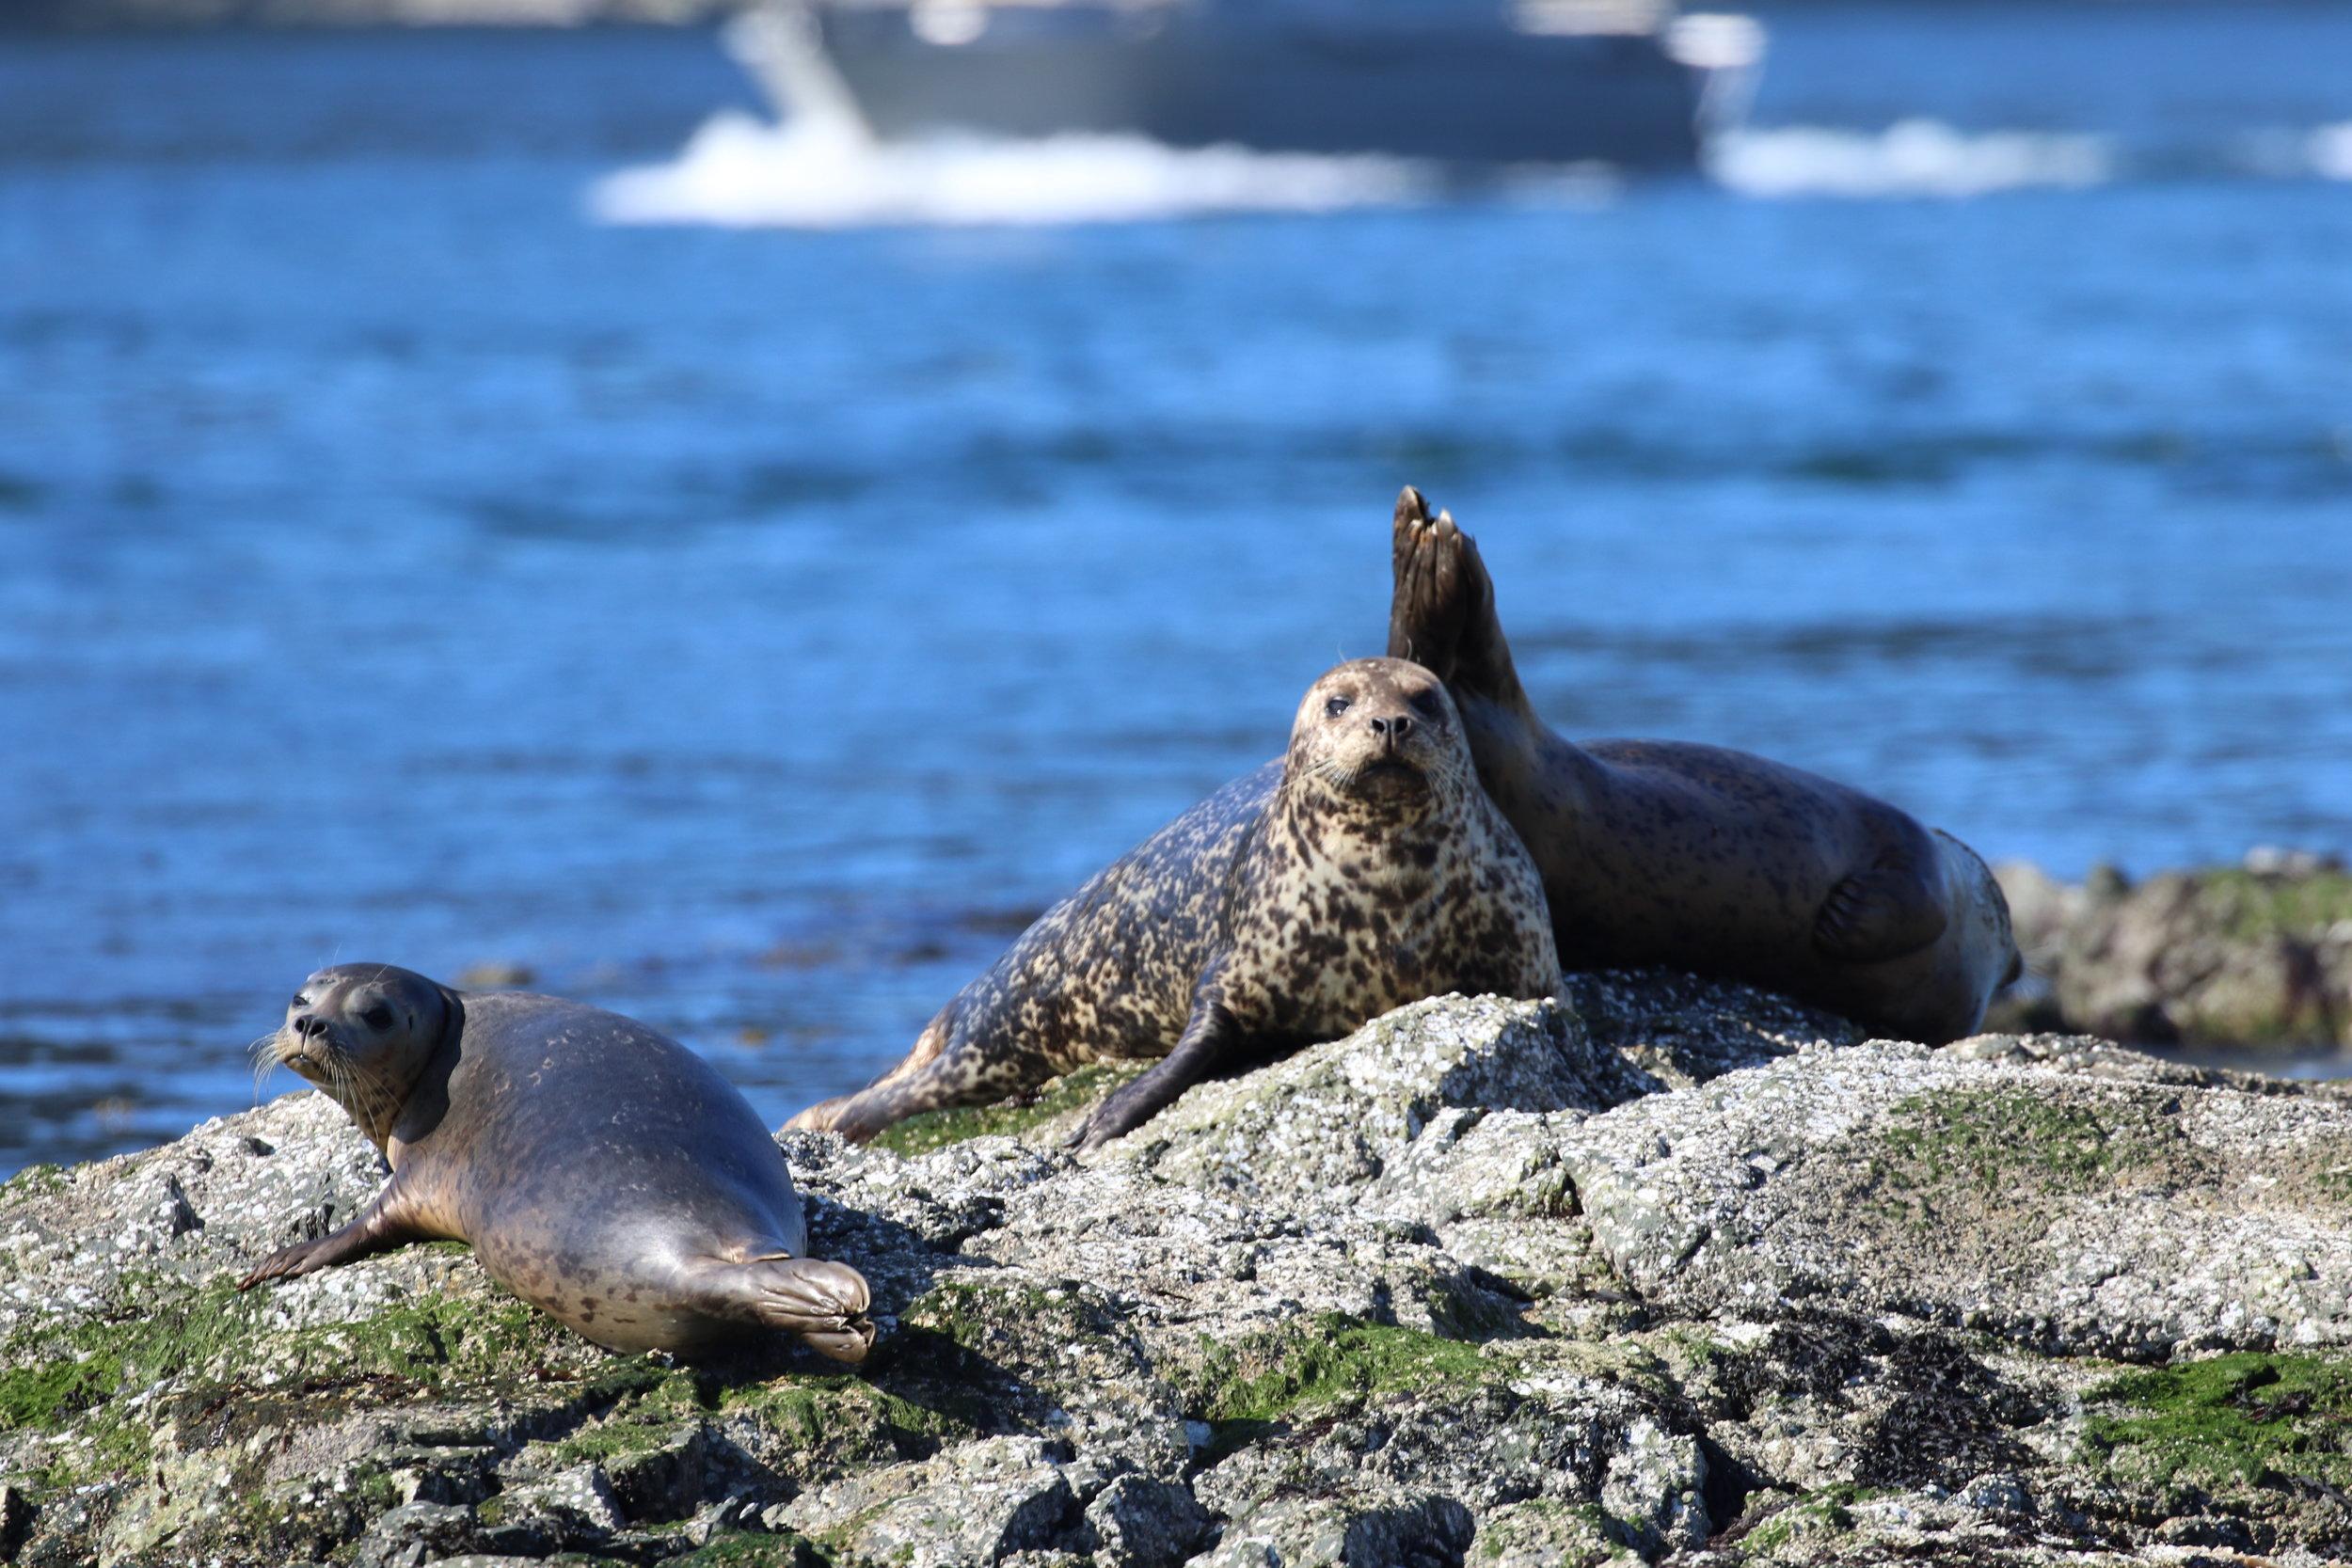 Some harbour seals. Photo by Ryan Uslu (3:30).